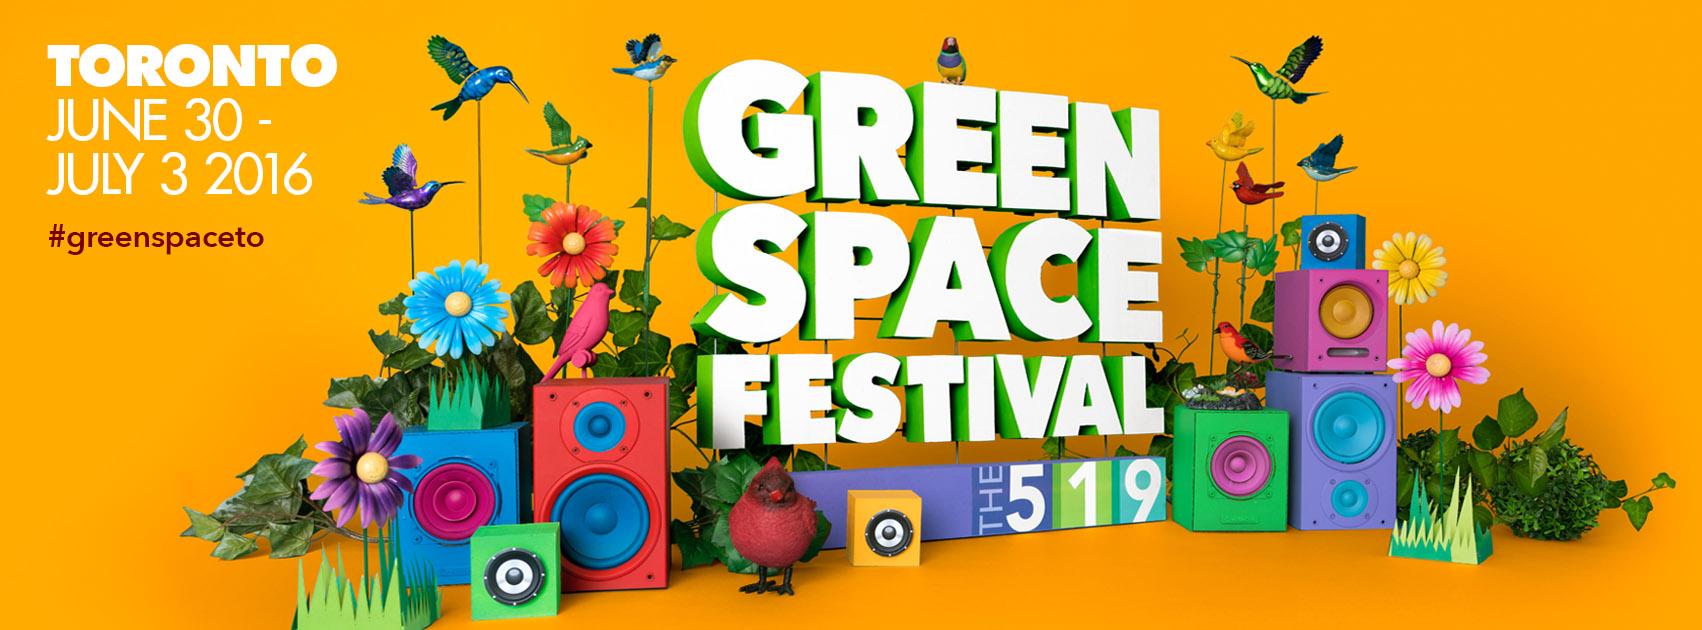 greenspace2016-02